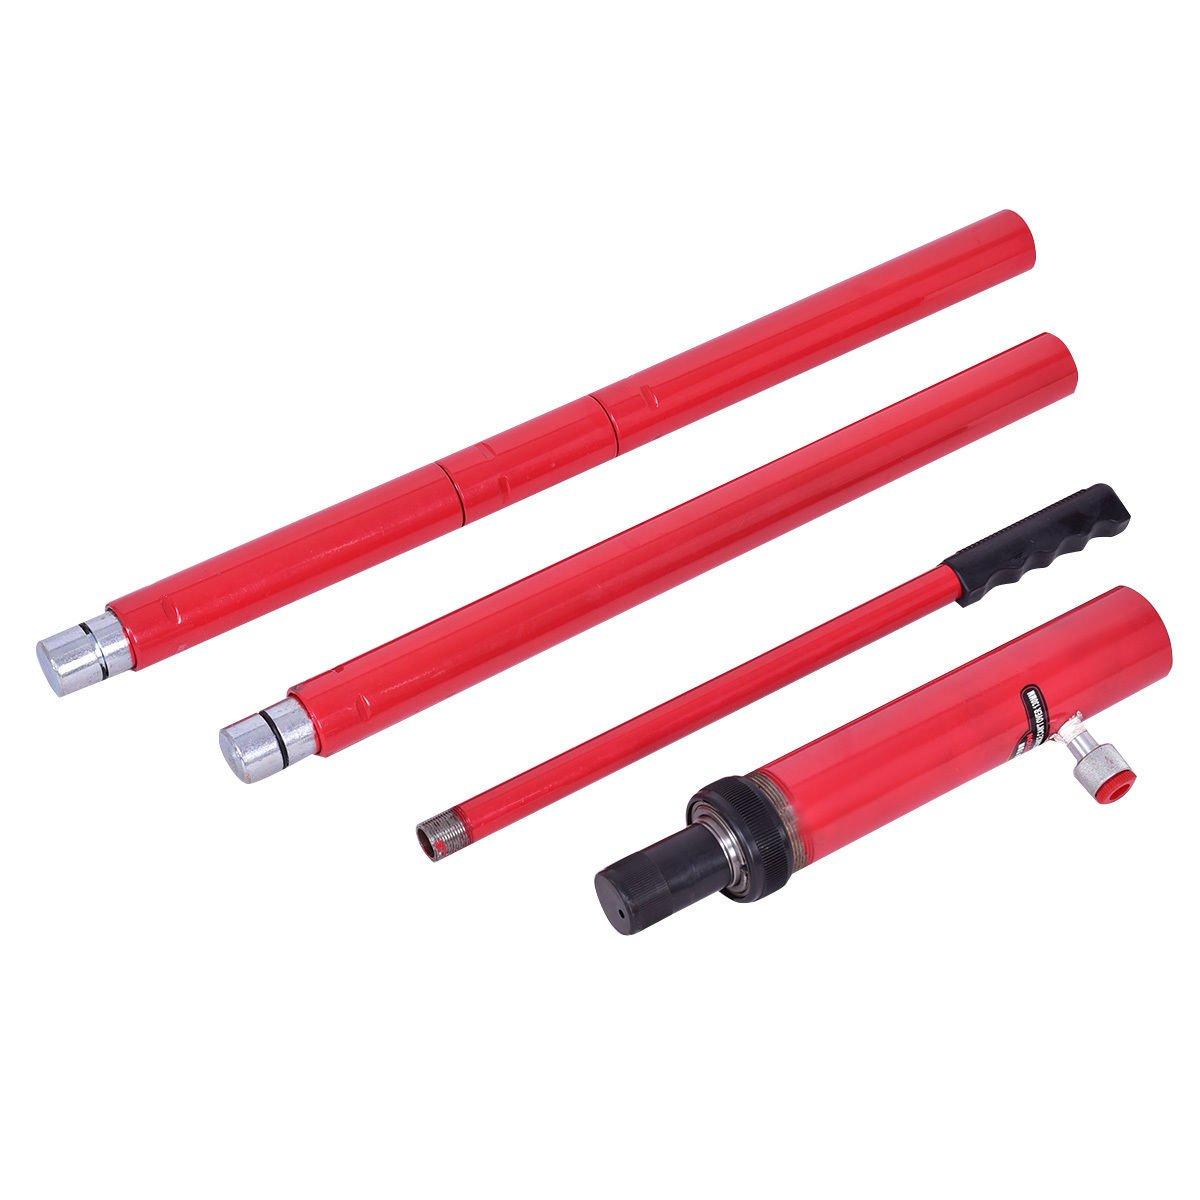 Goplus Porta Power Hydraulic Jack Auto Body Frame Repair Kit Shop Tool Lift Ram w/Carrying Case, 10 Ton Capacity by Goplus (Image #6)